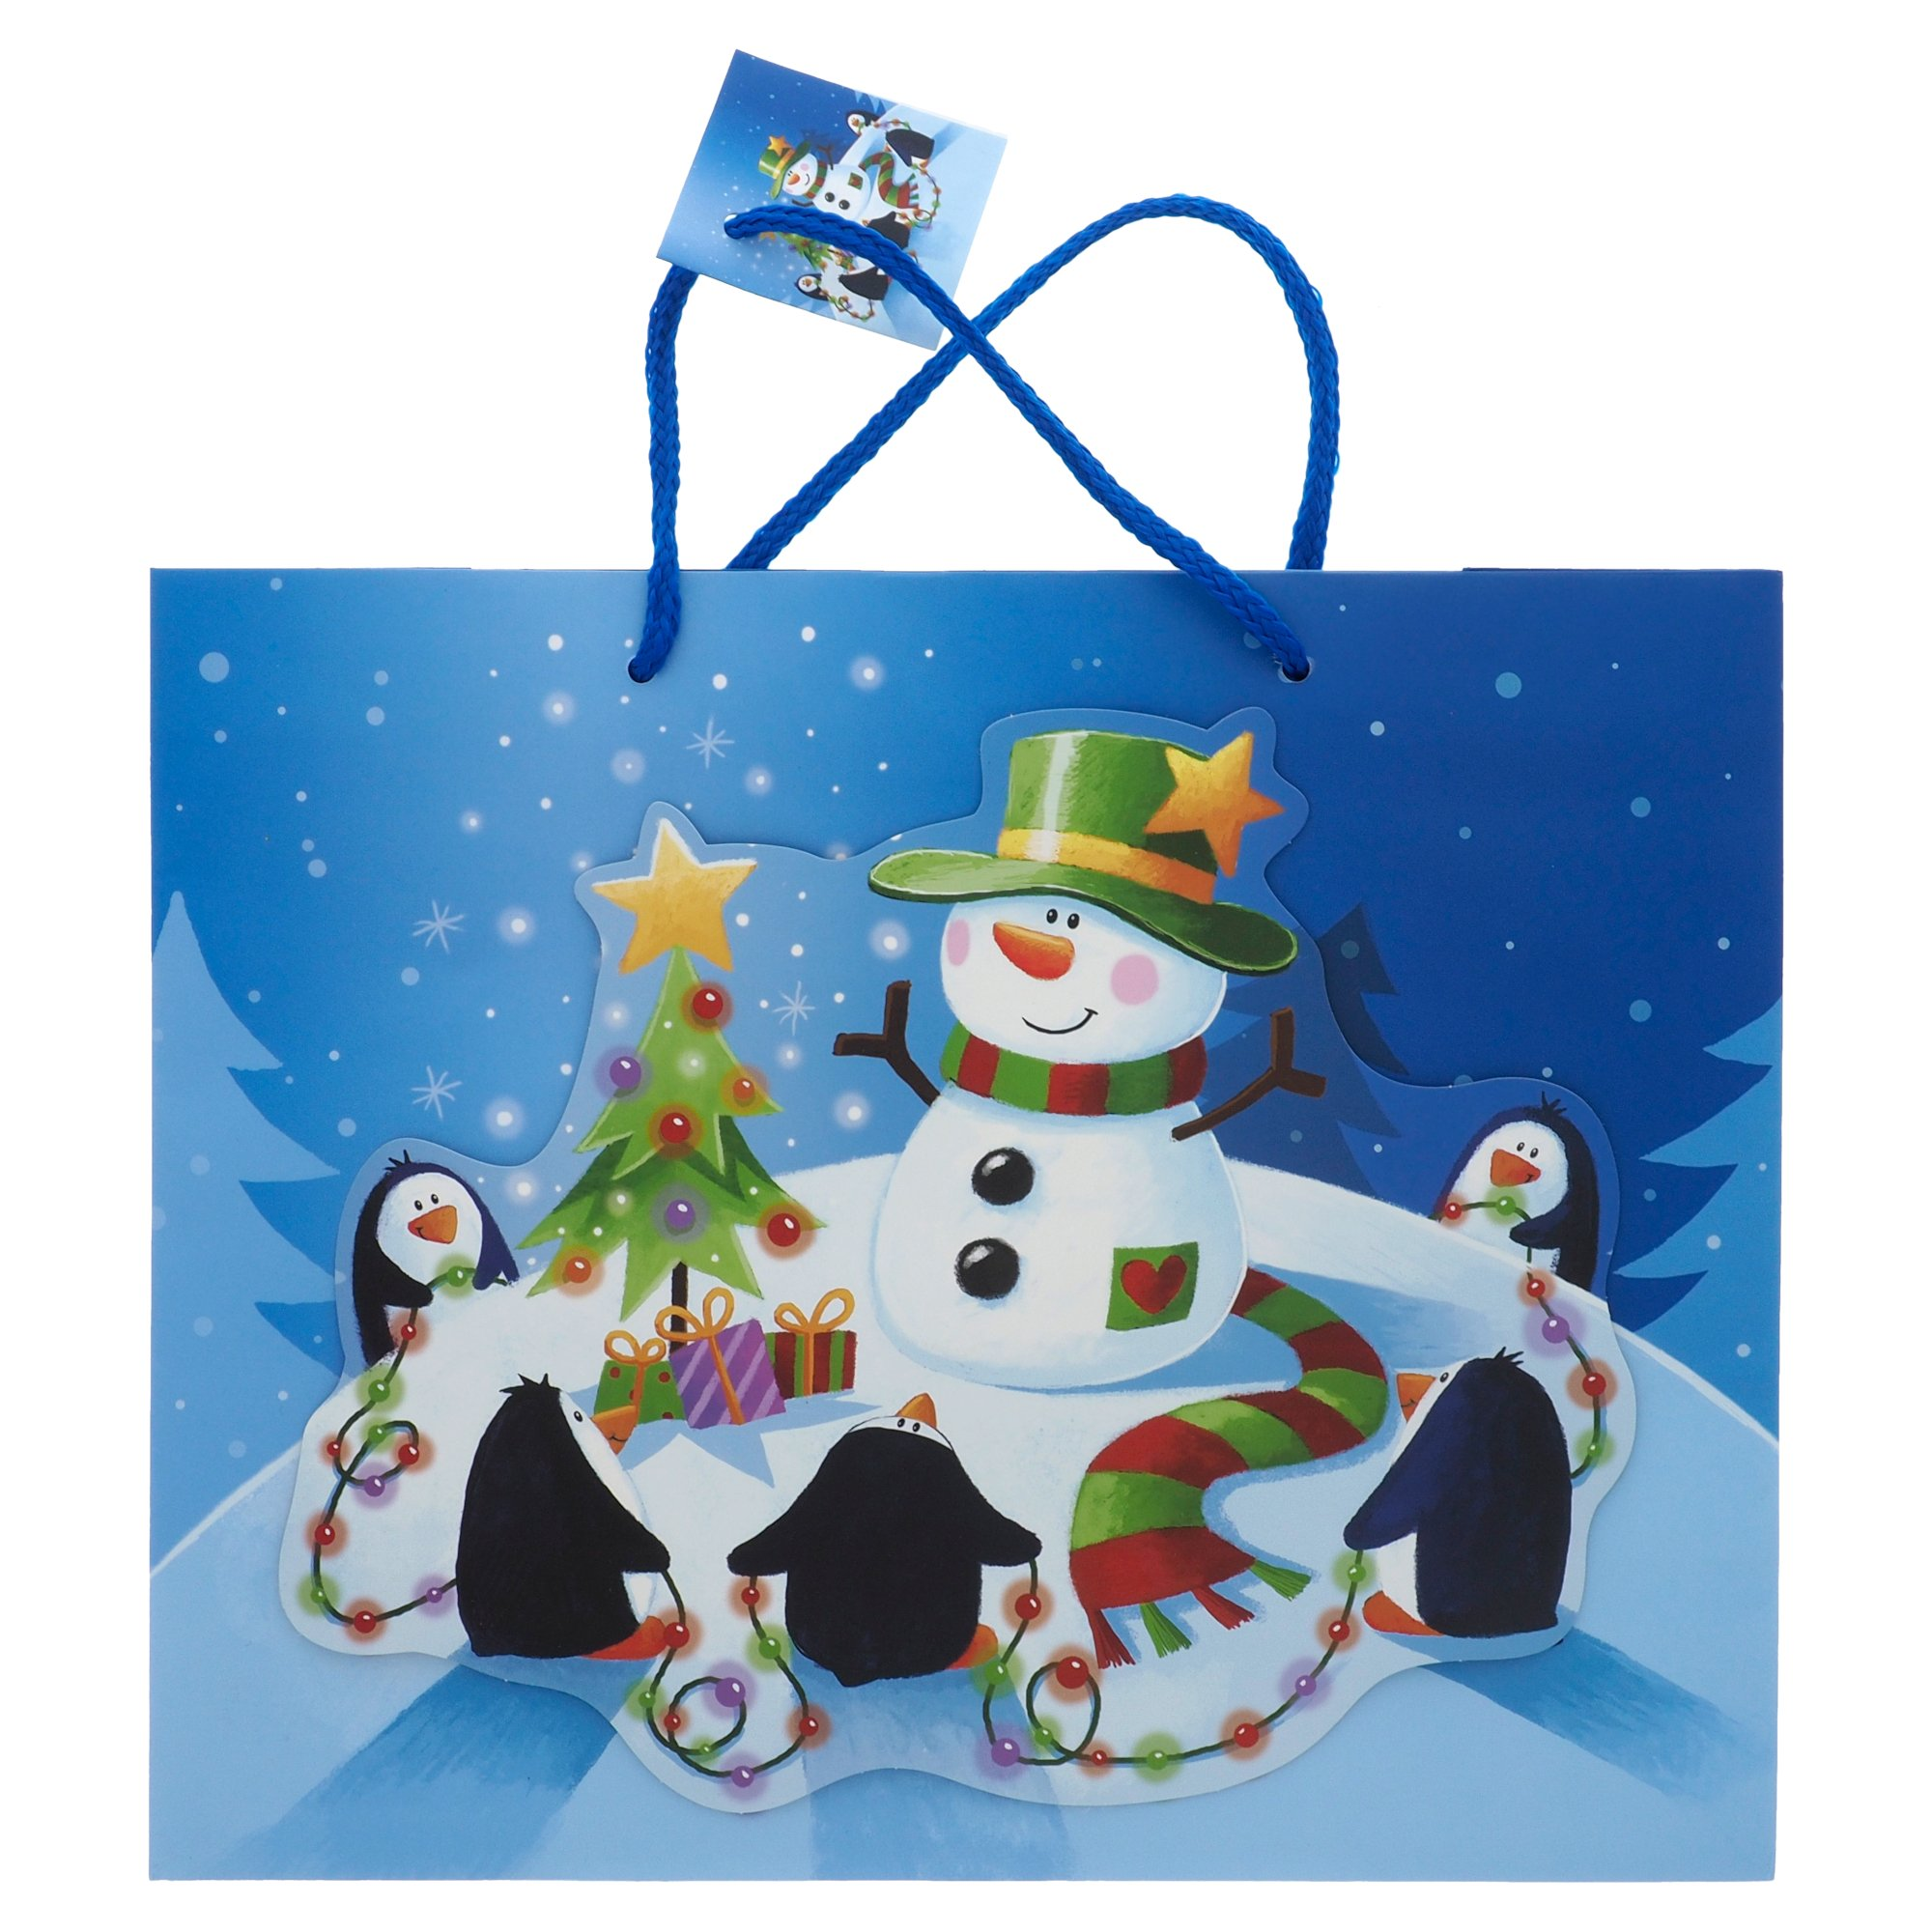 Grand sac à cadeau à motifs de Noël (Couleurs et motifs assortis)